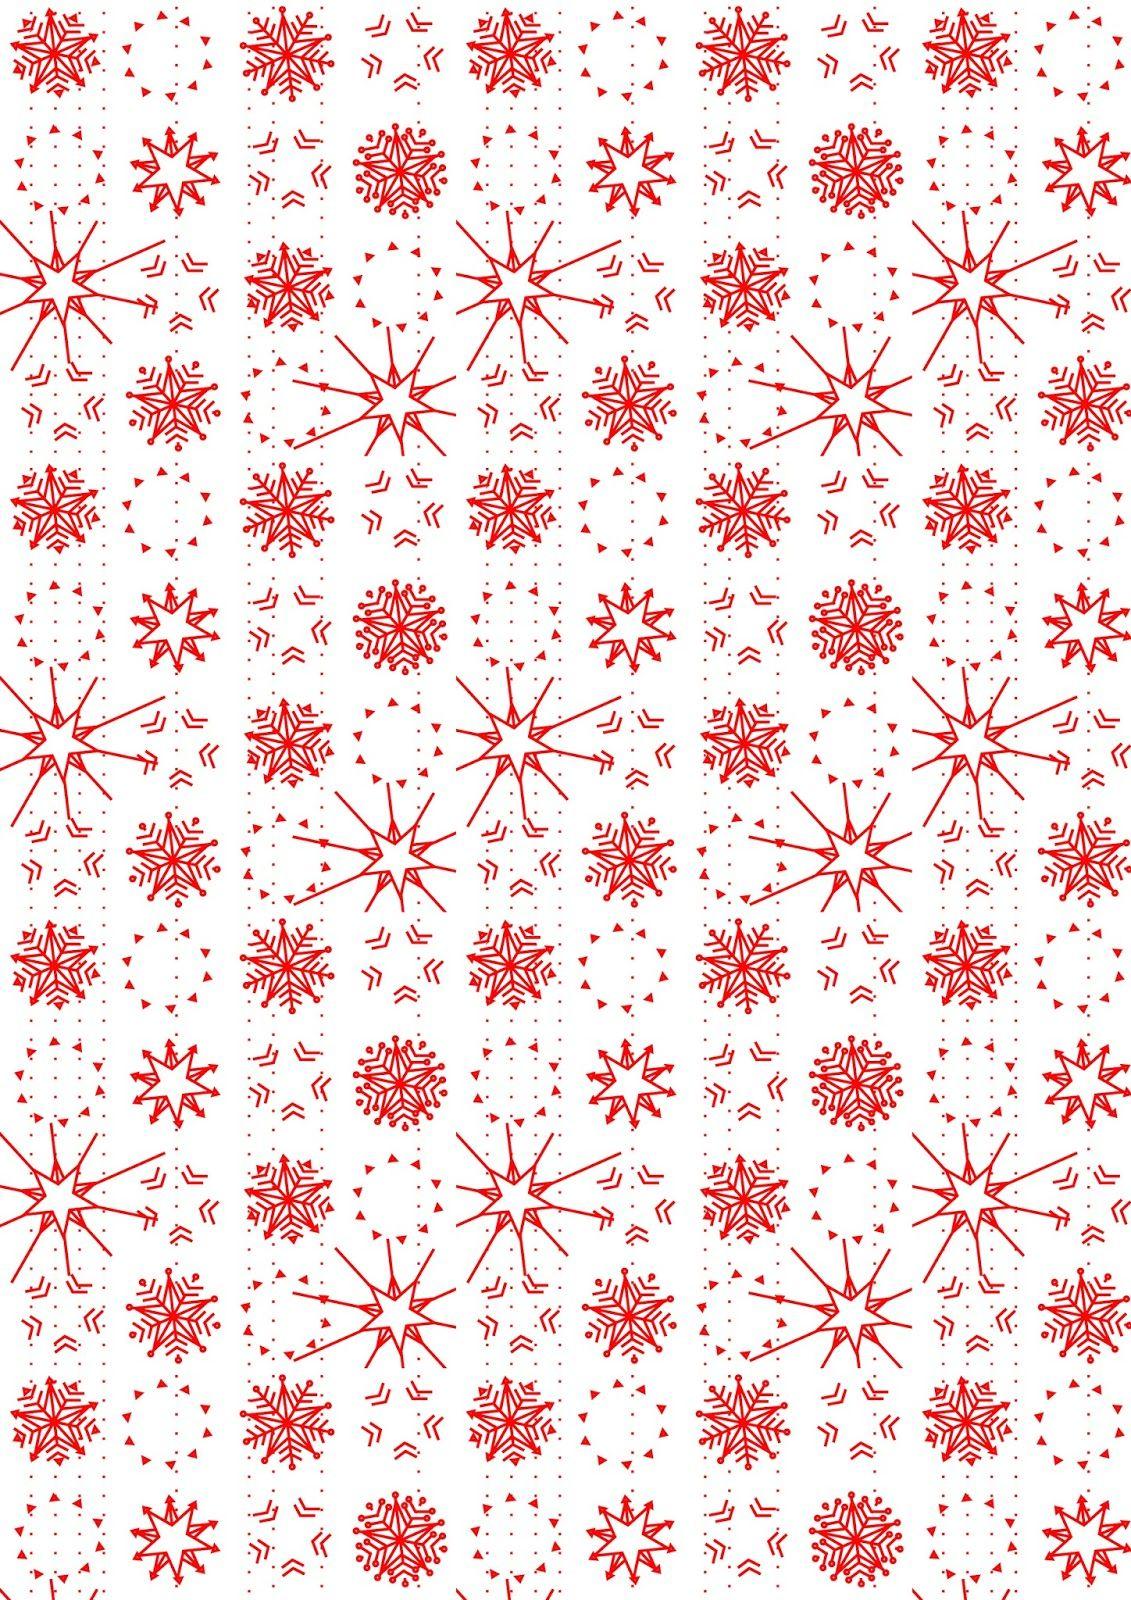 printable snowflake pattern paper christmas printable snowflake pattern paper christmas